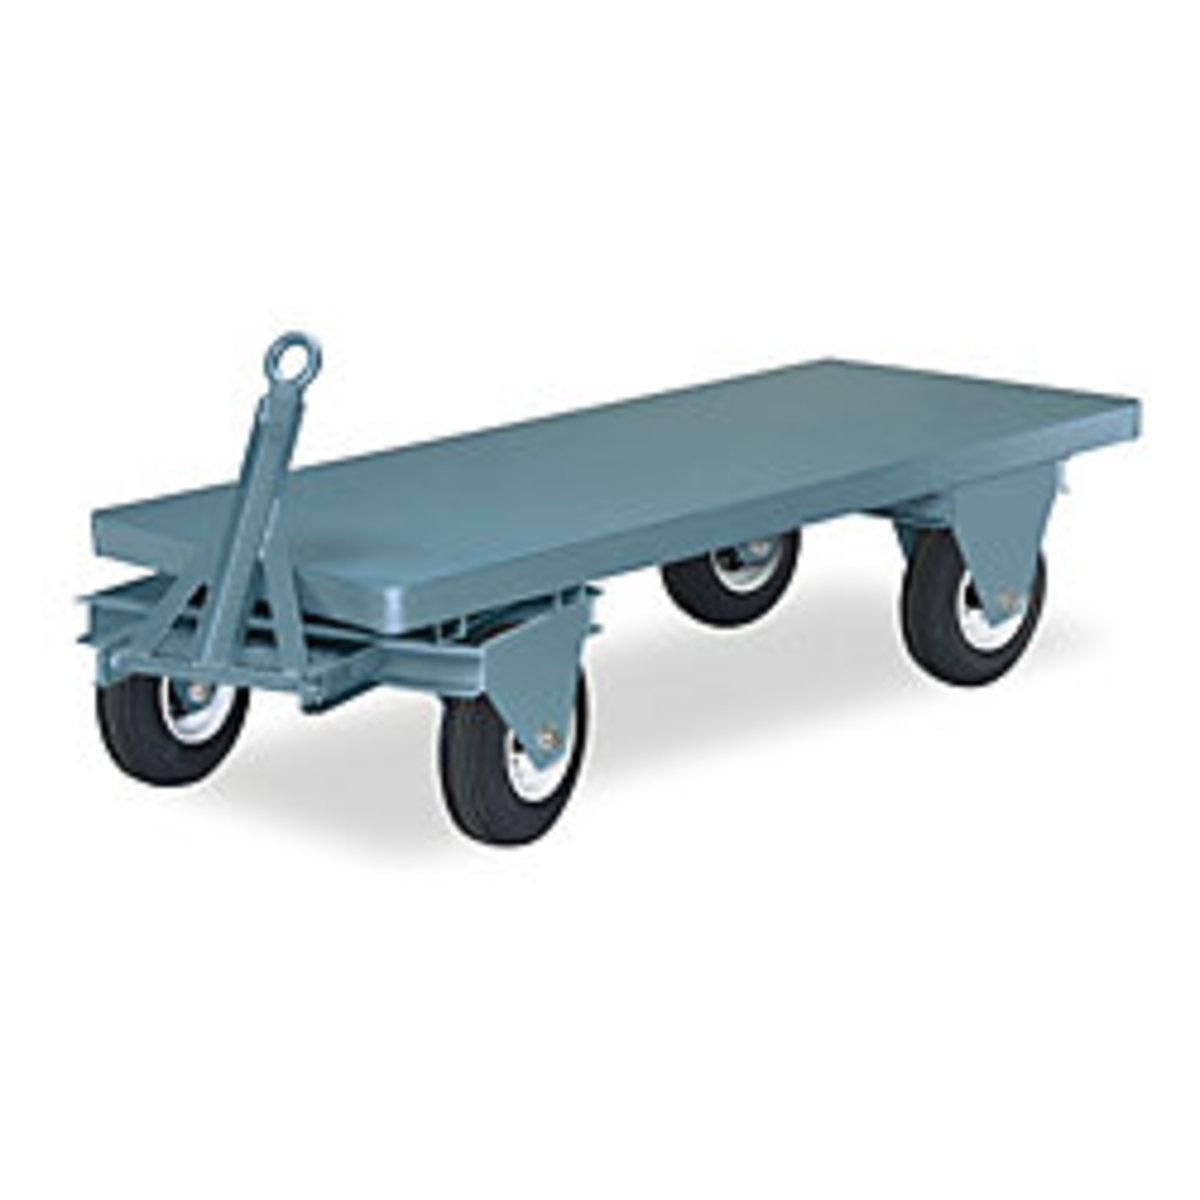 Platform Truck, Load Capacity 4500 Pounds, Deck Length 96 Inches, Deck Height 22 1/4 Inches, Deck Width 36 Inches, Platform Style Fifth Wheel Trailer, Wheel Pneumatic